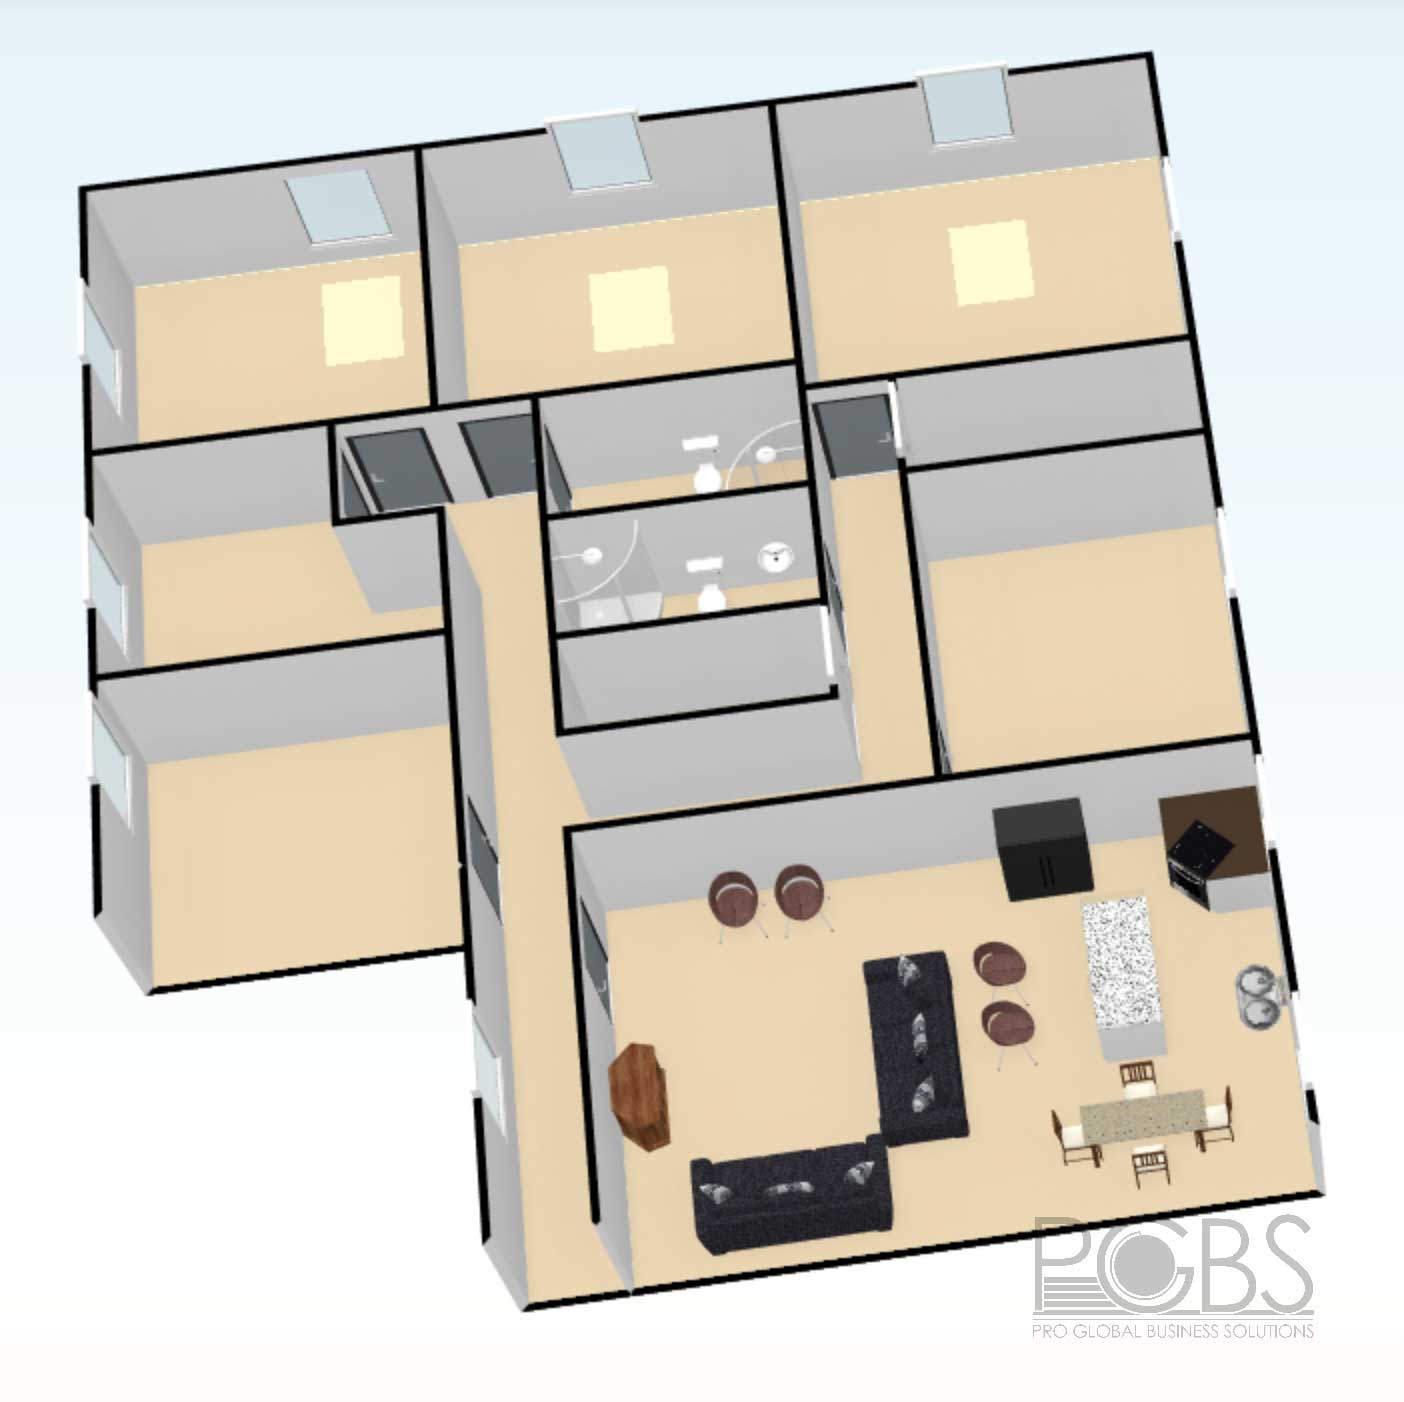 5 bedroom house designs isometric view